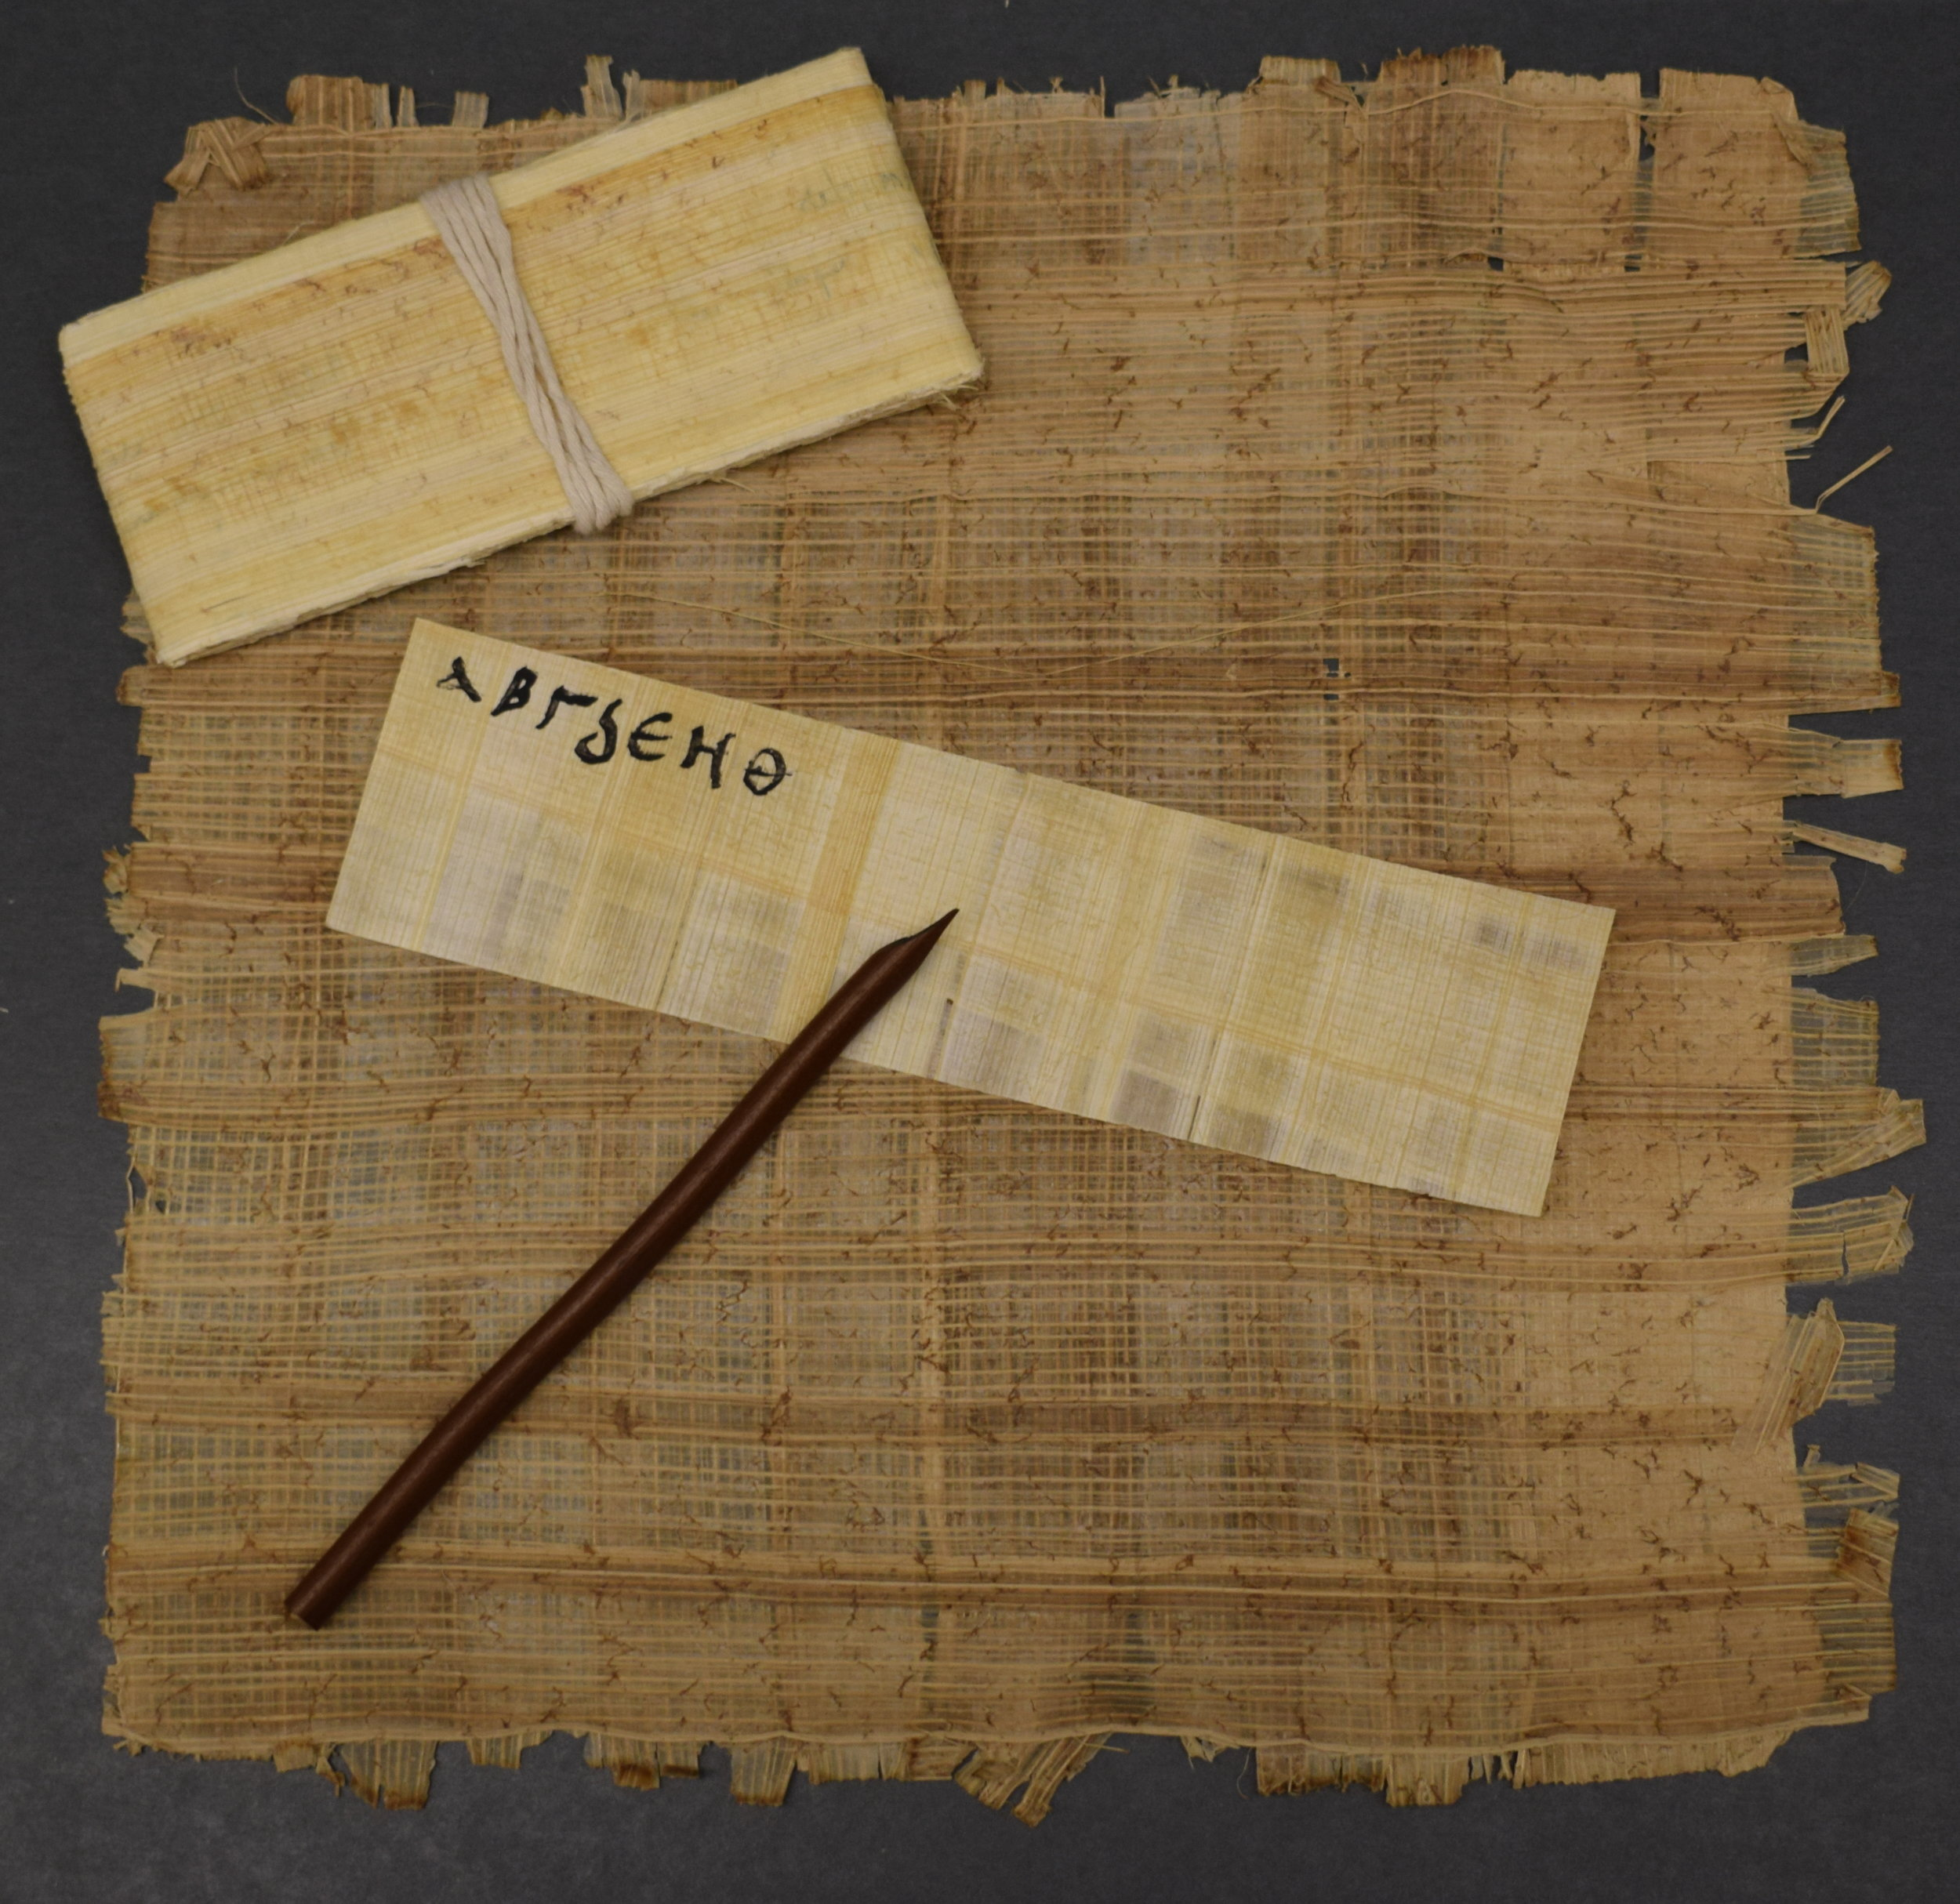 papyrus_DSC_0469.JPG